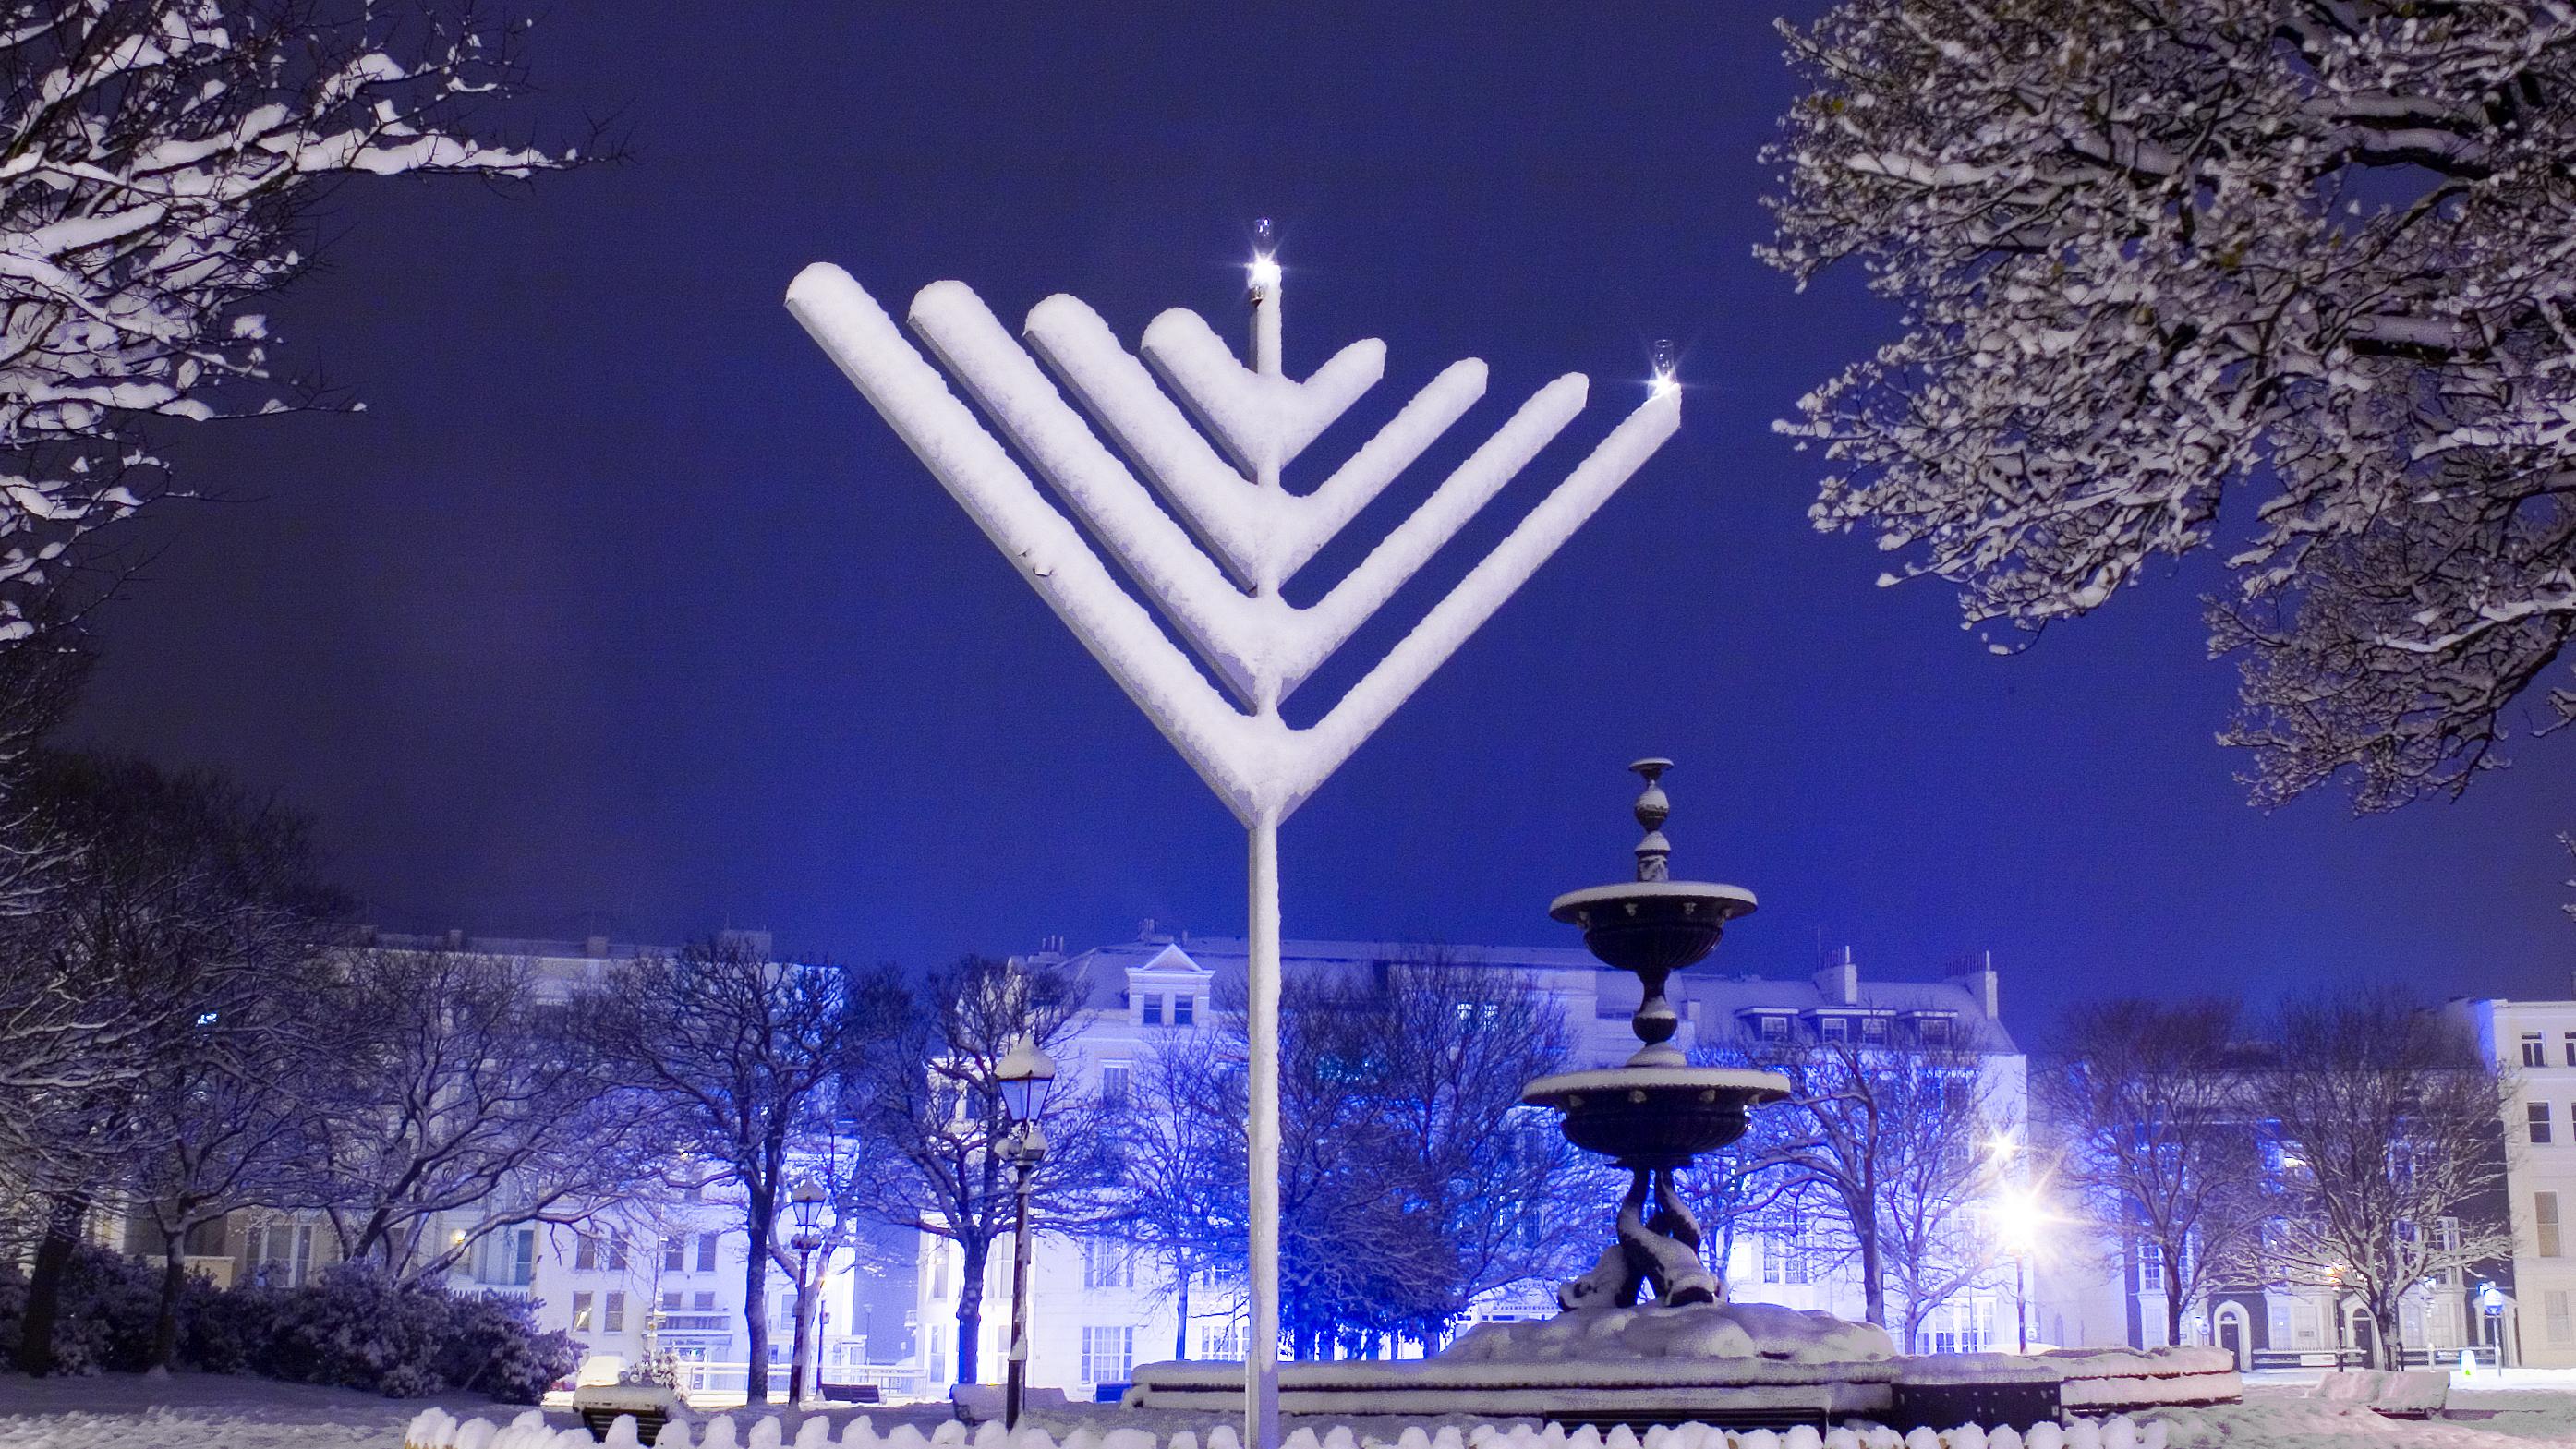 & Hanukkah Lights 2015 : NPR azcodes.com